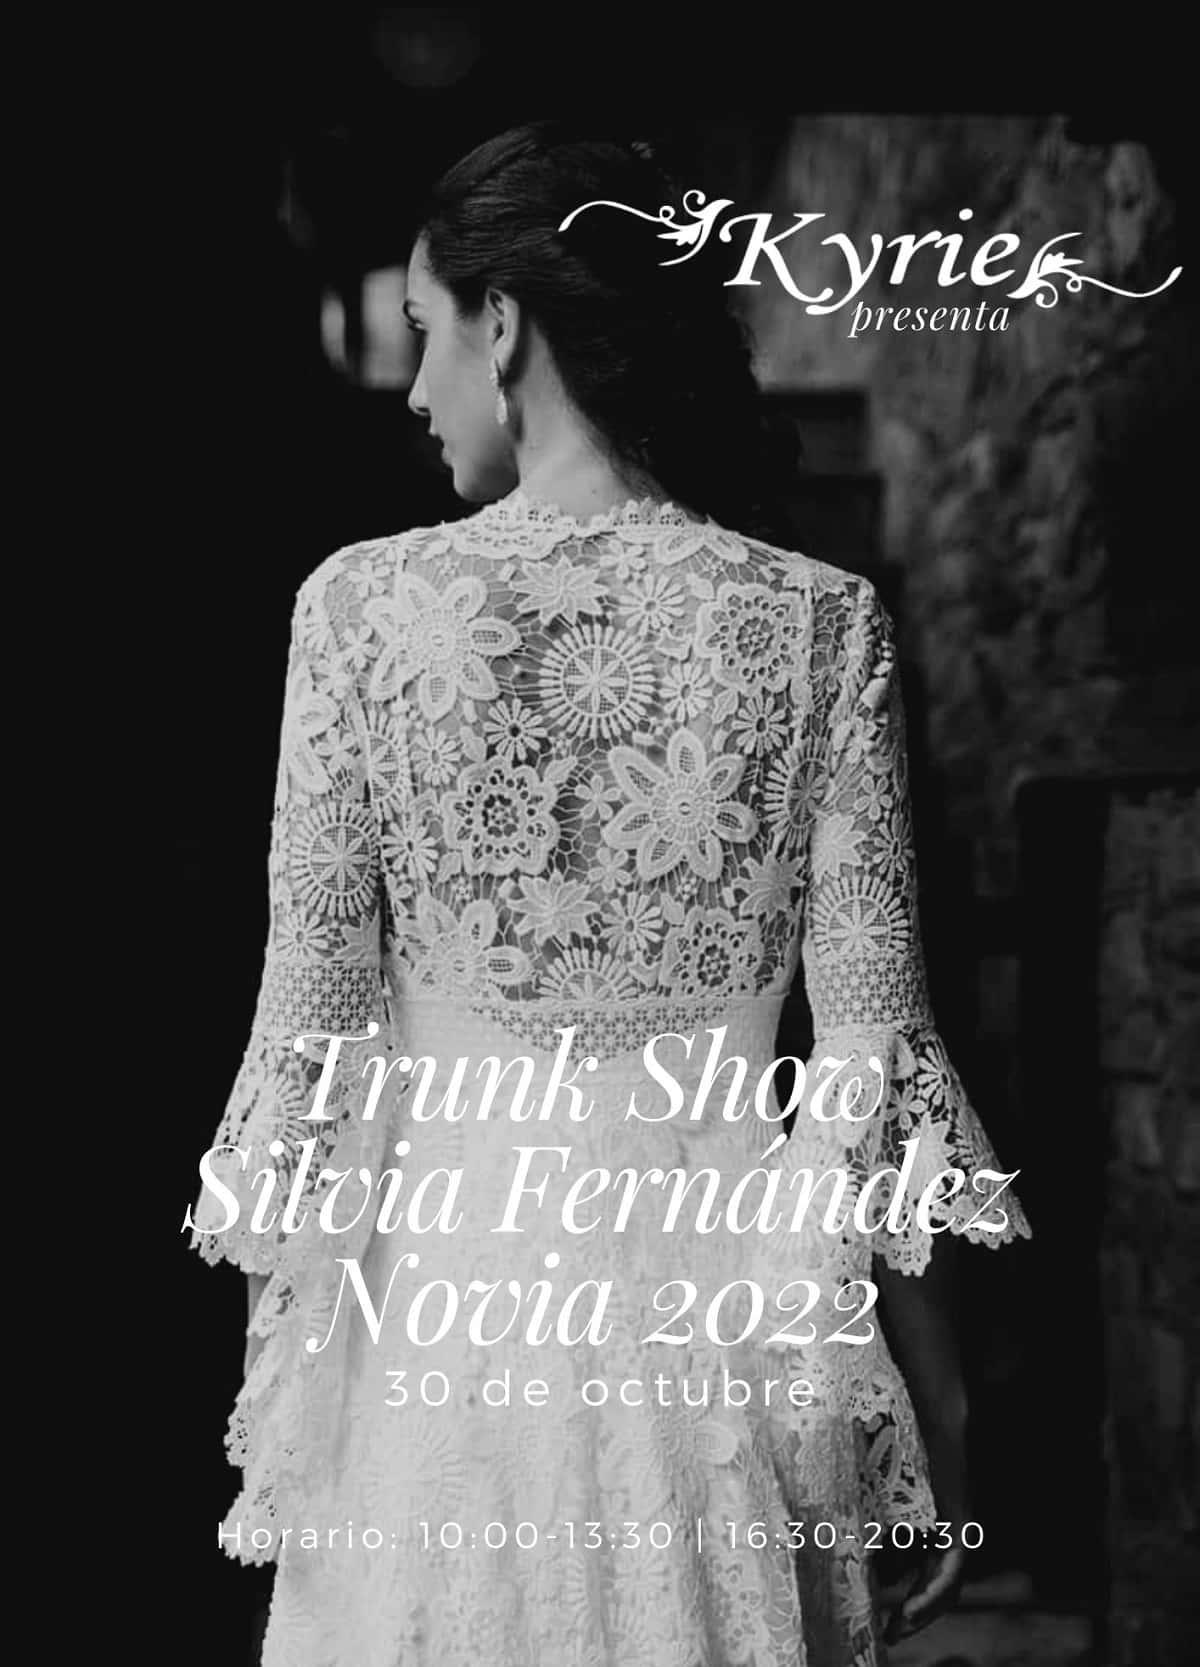 Presentación colección vestidos de novia Silvia Fernández 2022 en Kyrie